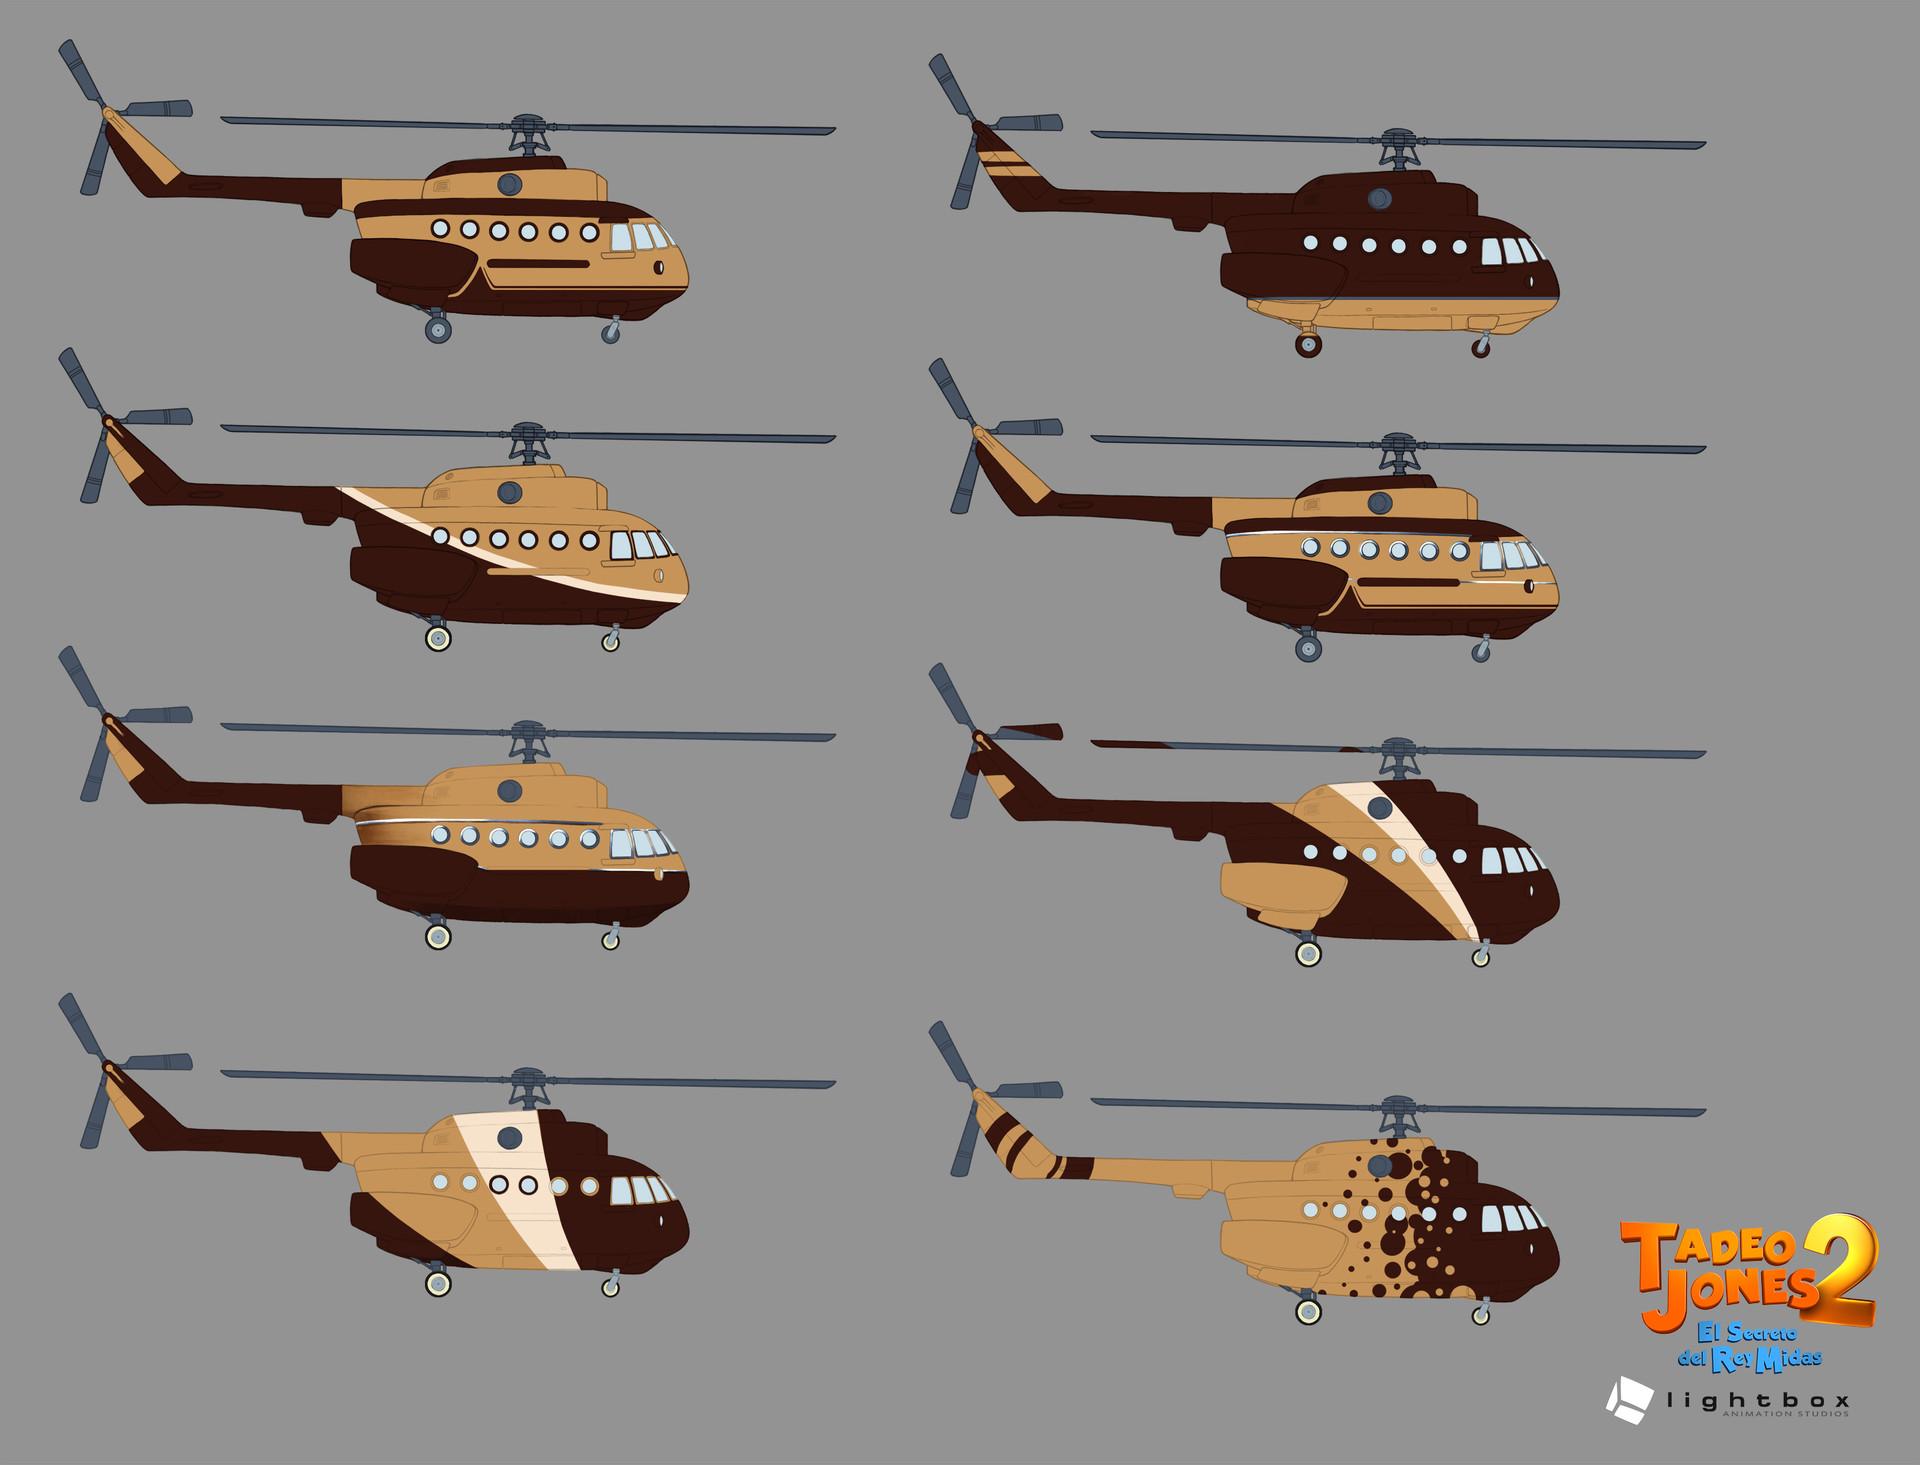 Angel oromendia helicopterpruebaspintura